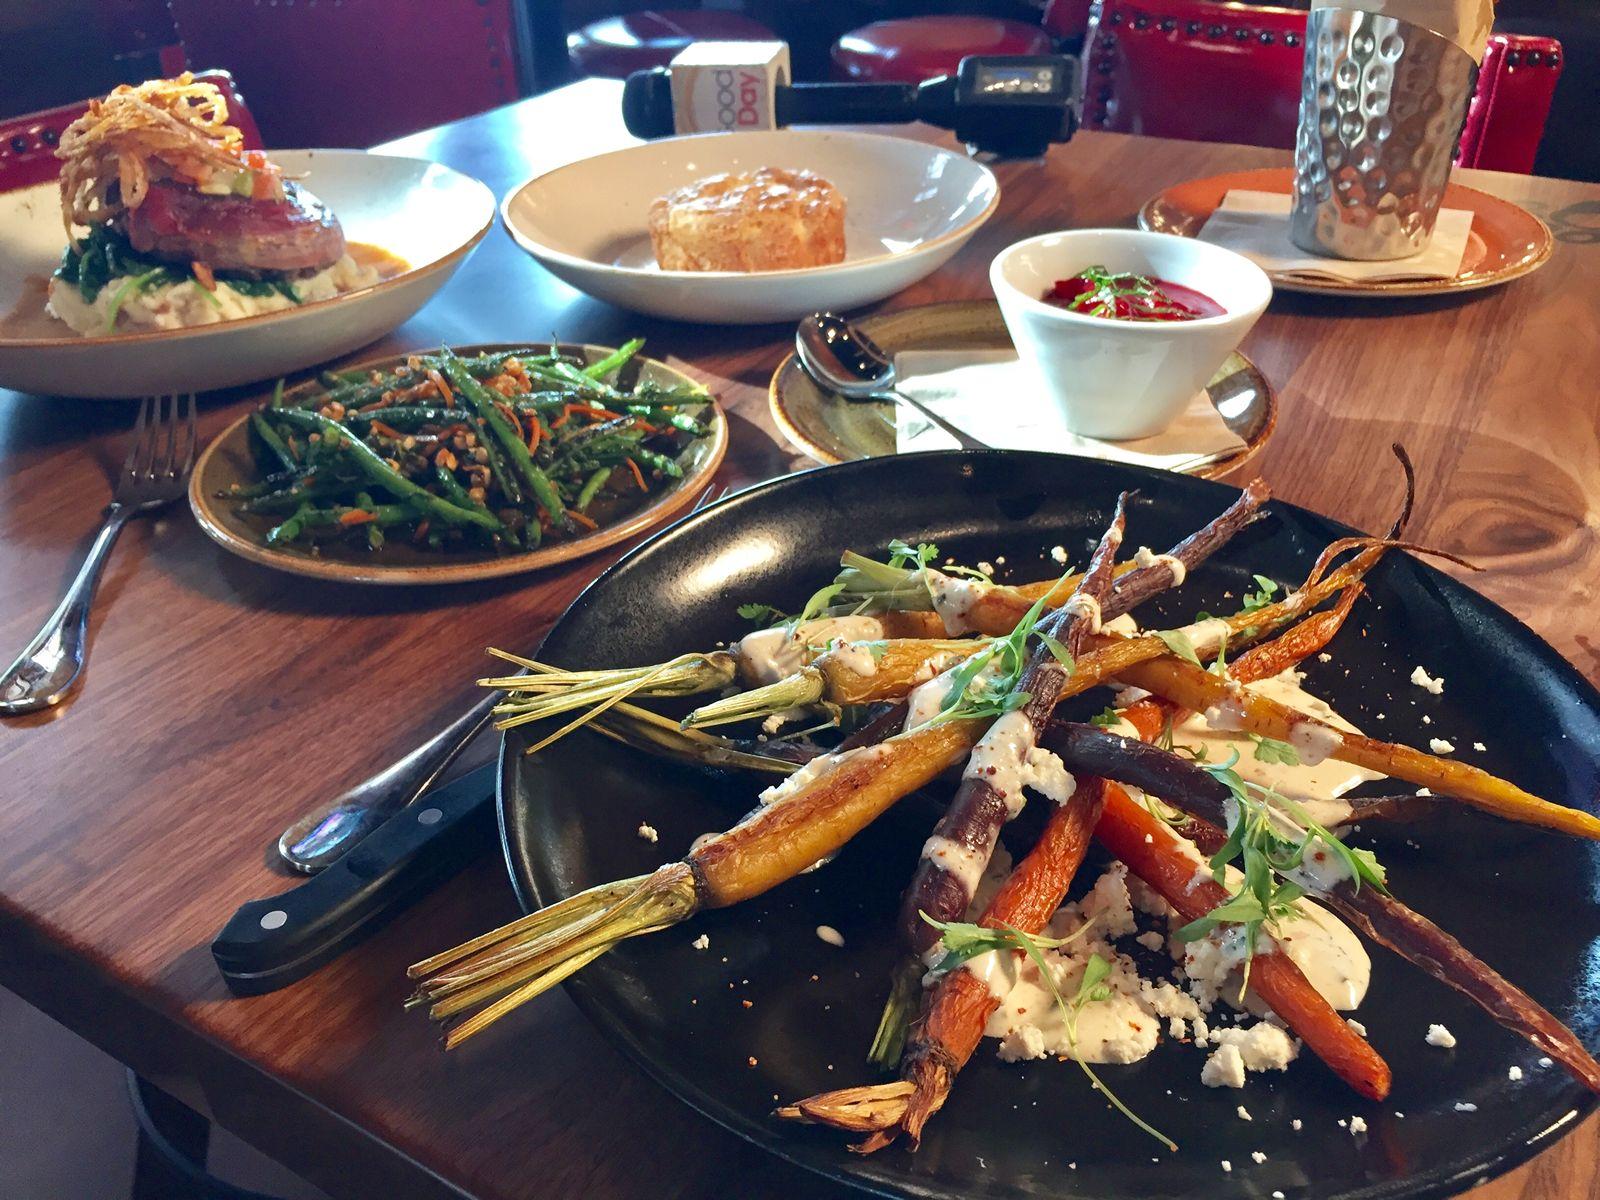 Lazy Dog Restaurant & Bar Debuts in Folsom, CA